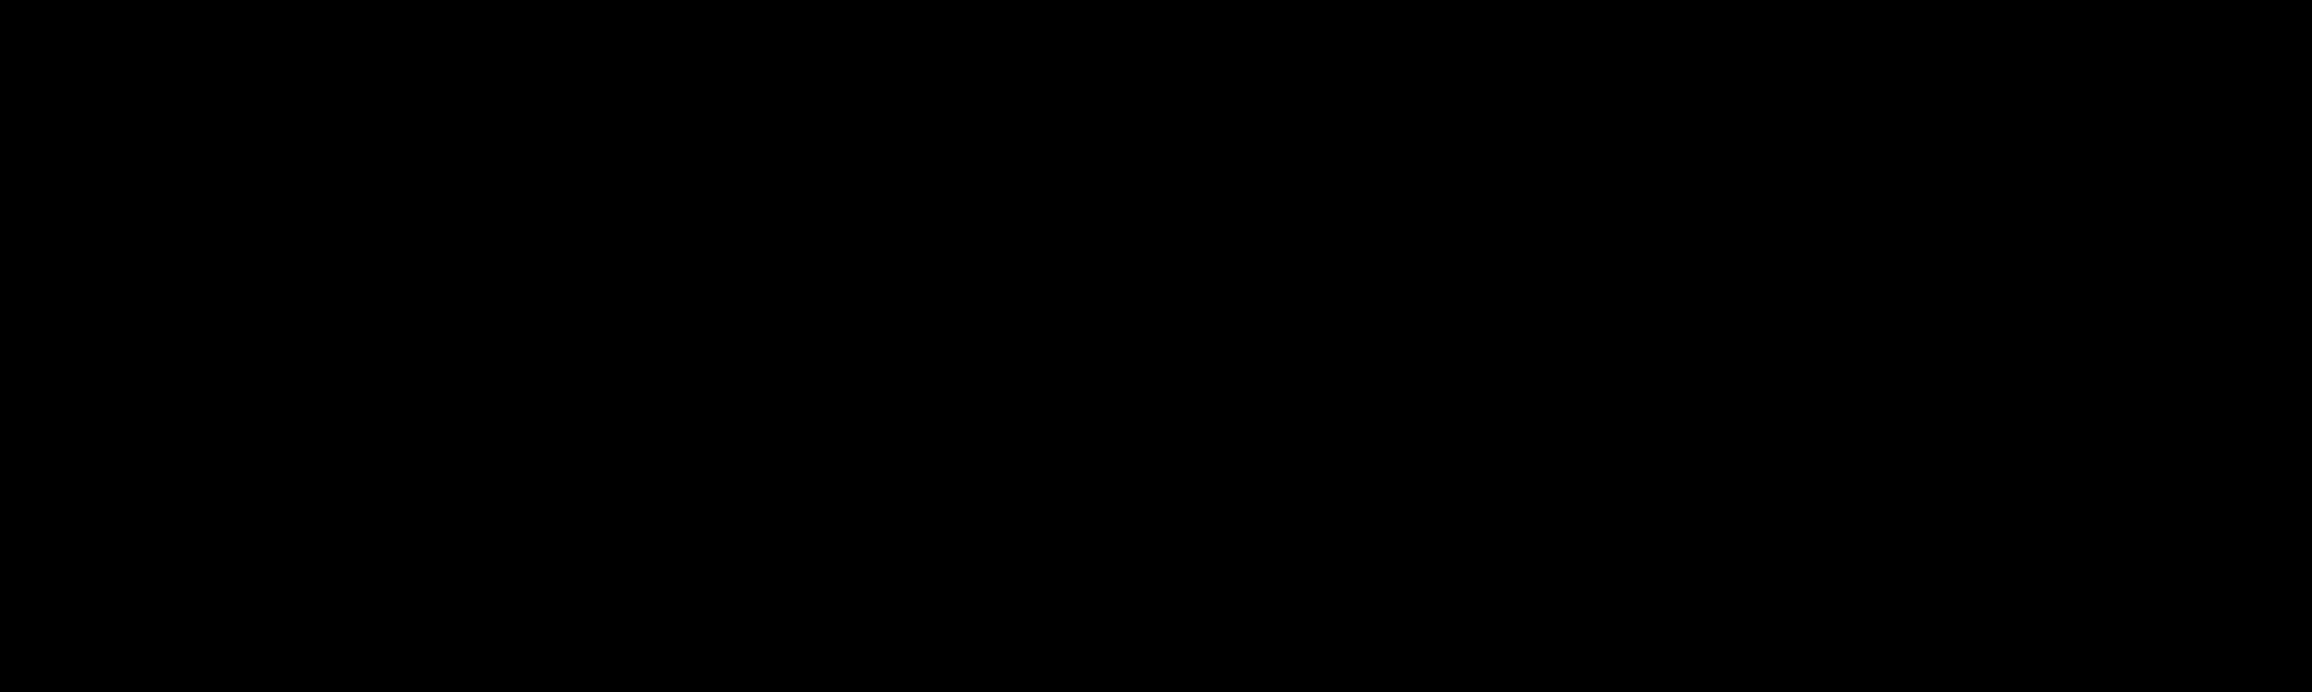 Curcumin-d<sub>6</sub>-monoalkyne